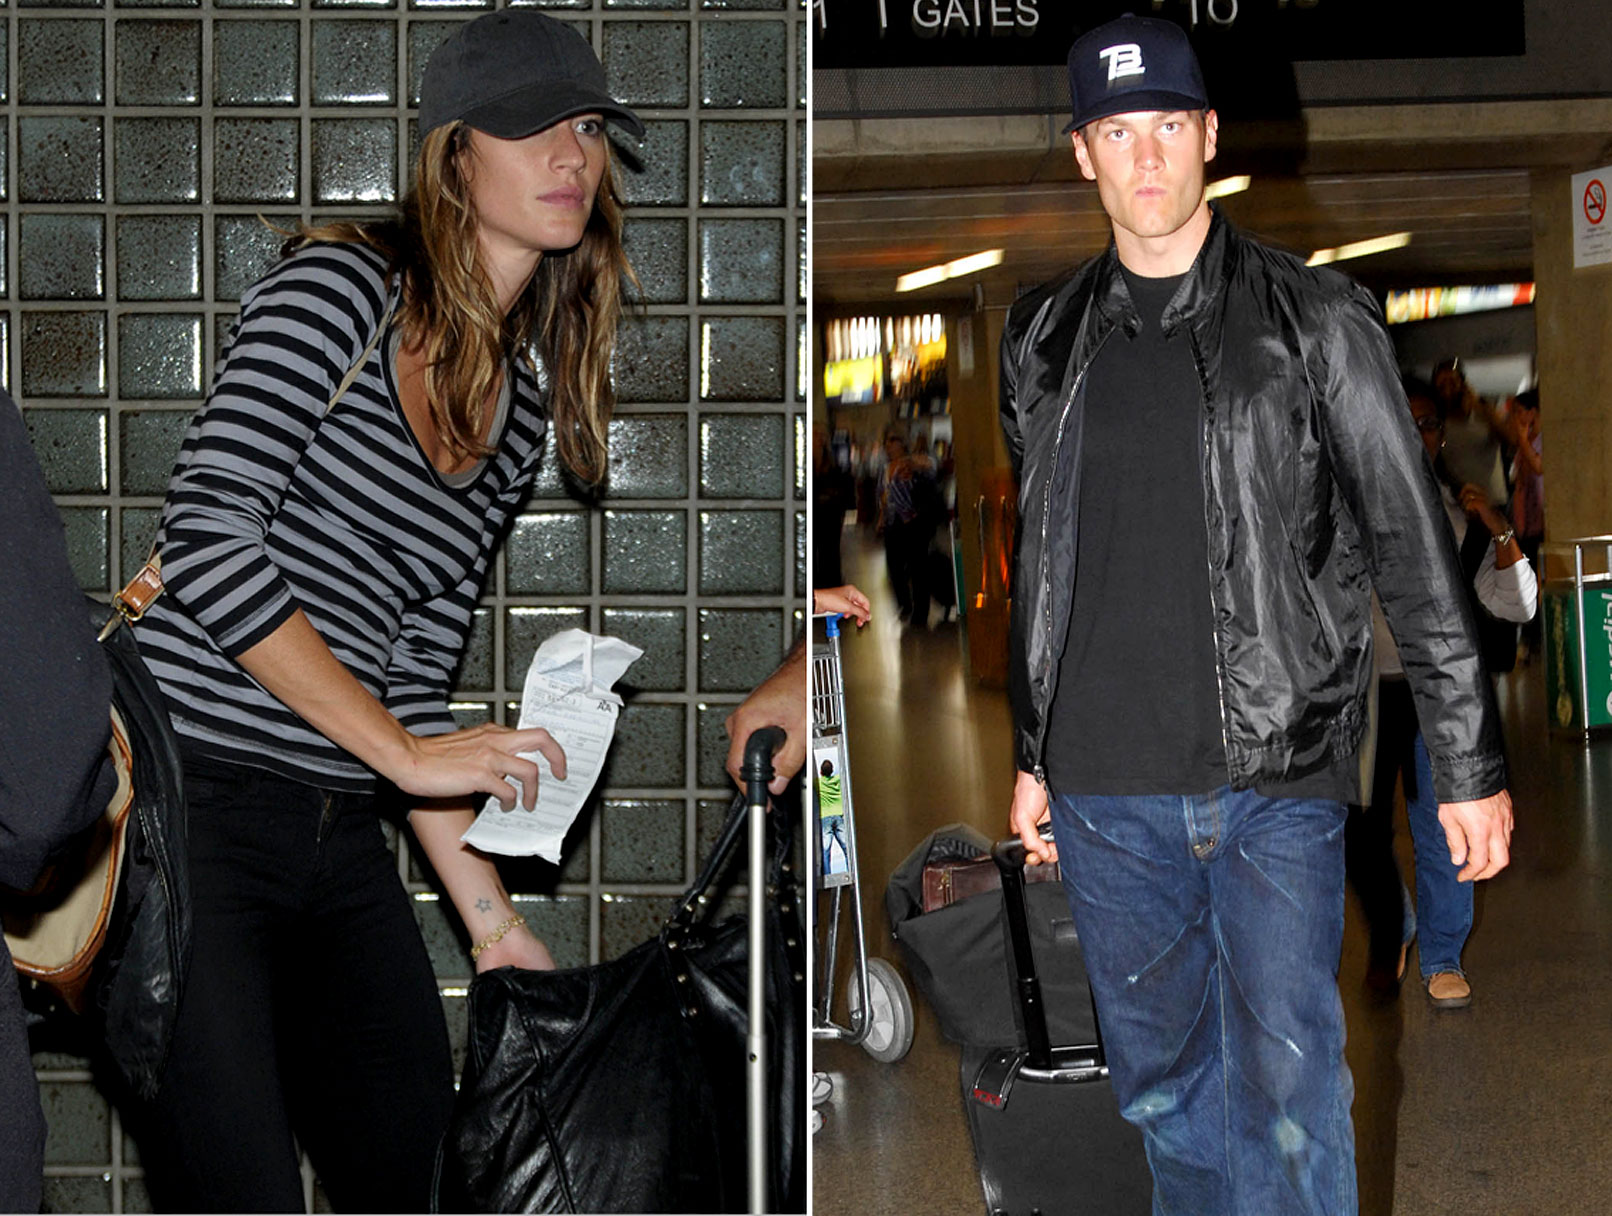 Tom Brady and Gisele Bundchen's Honeymoon Hijinks